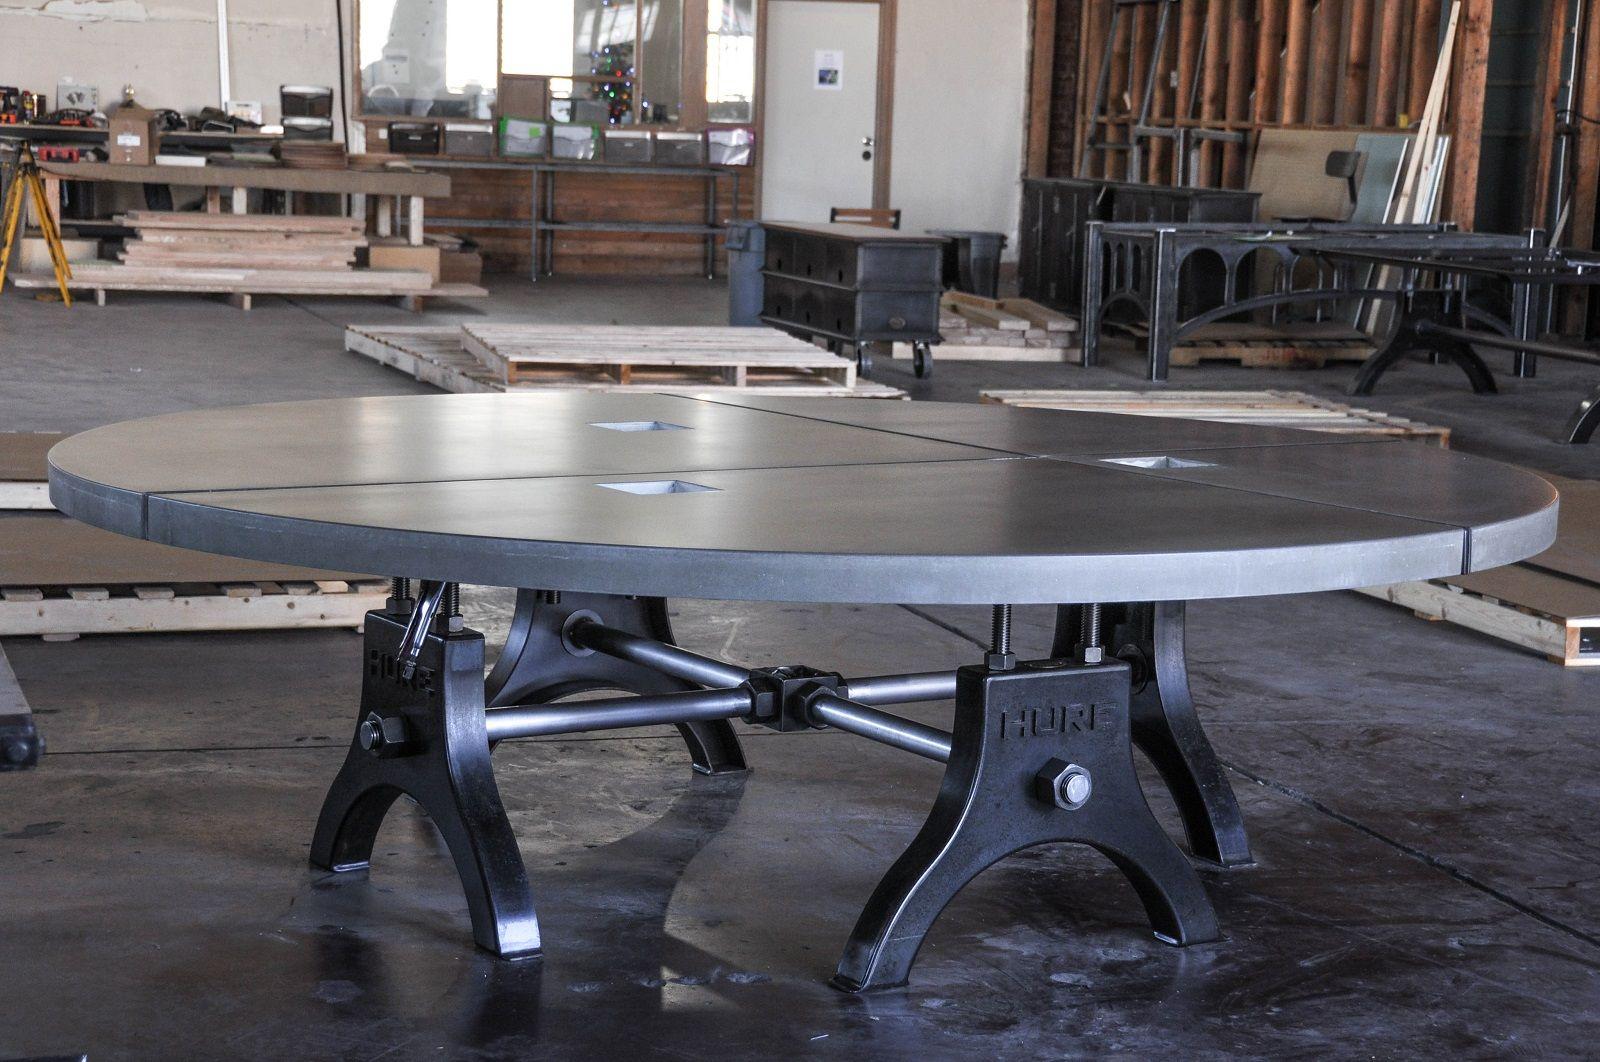 Post industrial conference table vintage industrial furniture - Hure Table Gallery Vintage Industrial Furniture